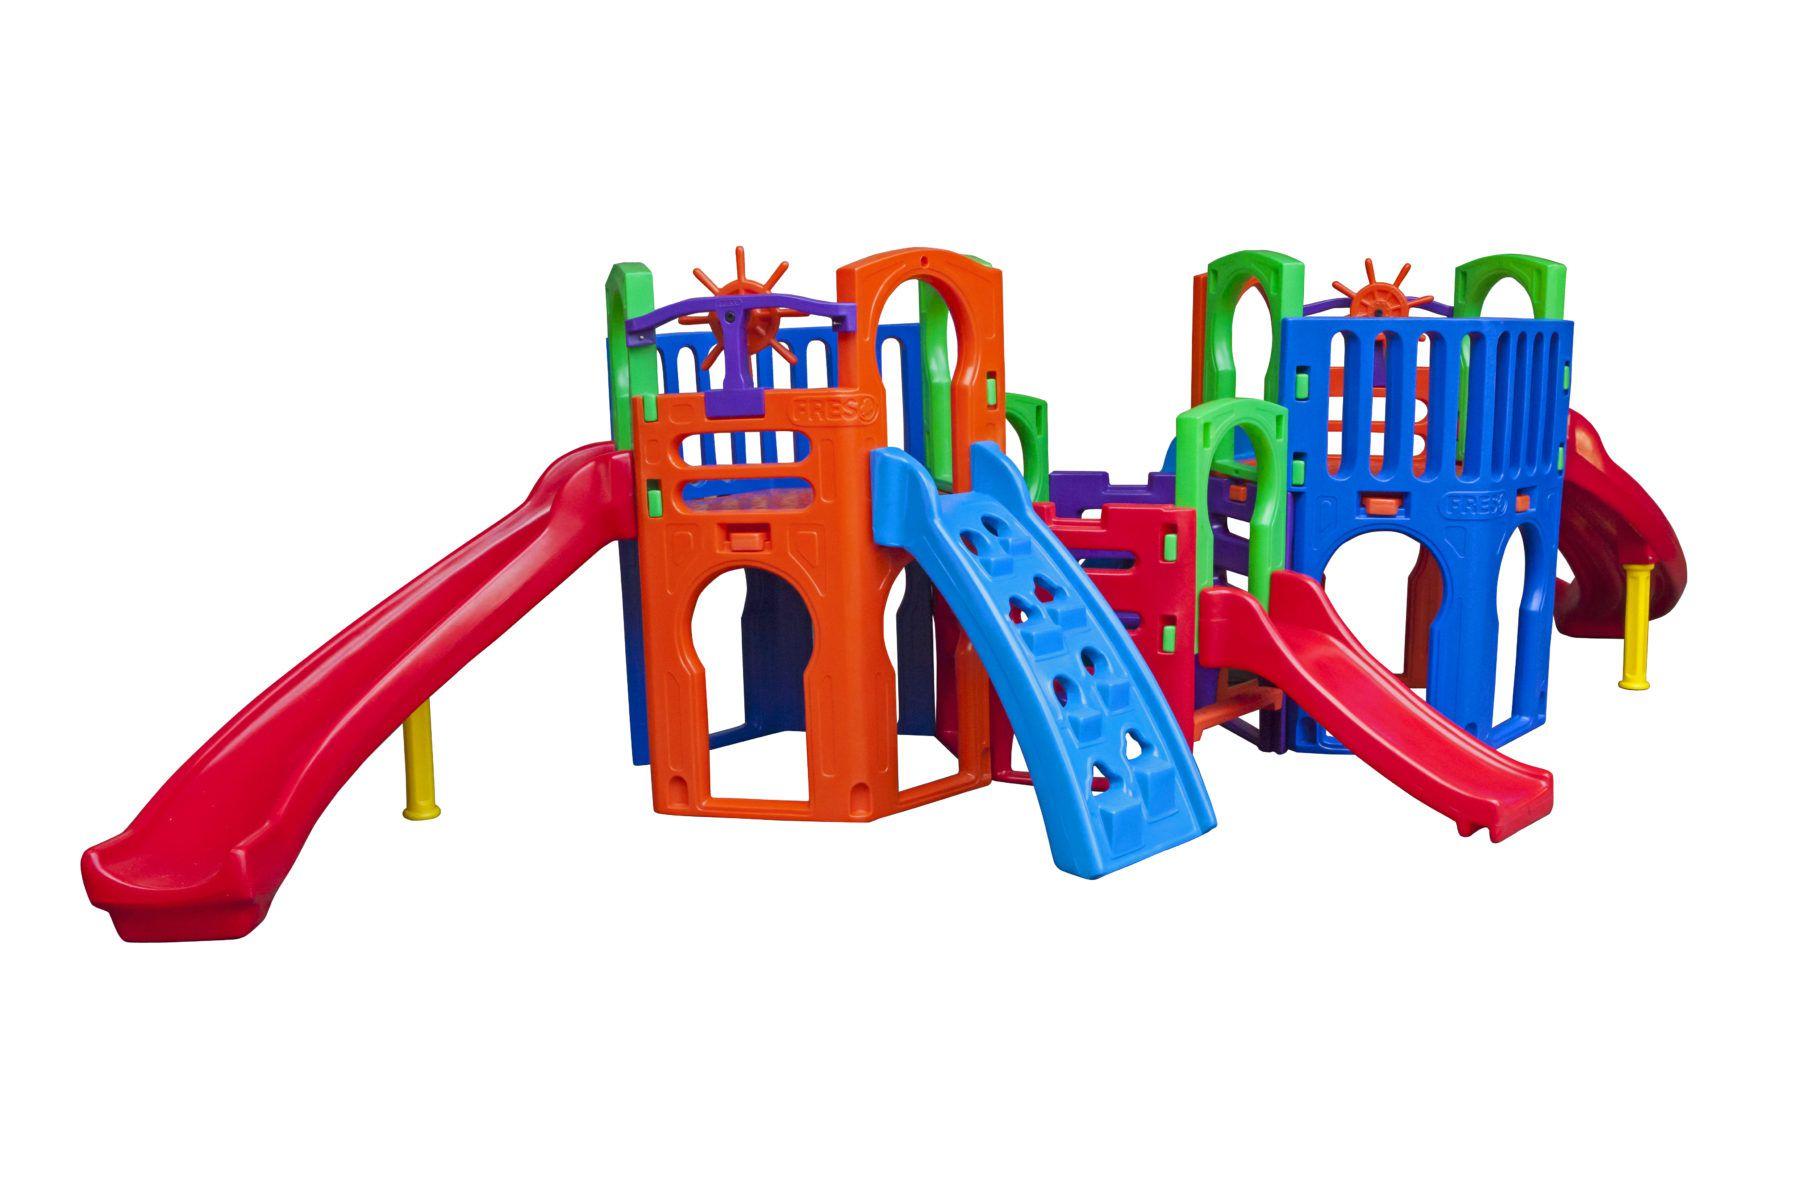 Playground Multiplay Plus | 6m20 x 3m20 x 1m85 | 1 a 12 anos